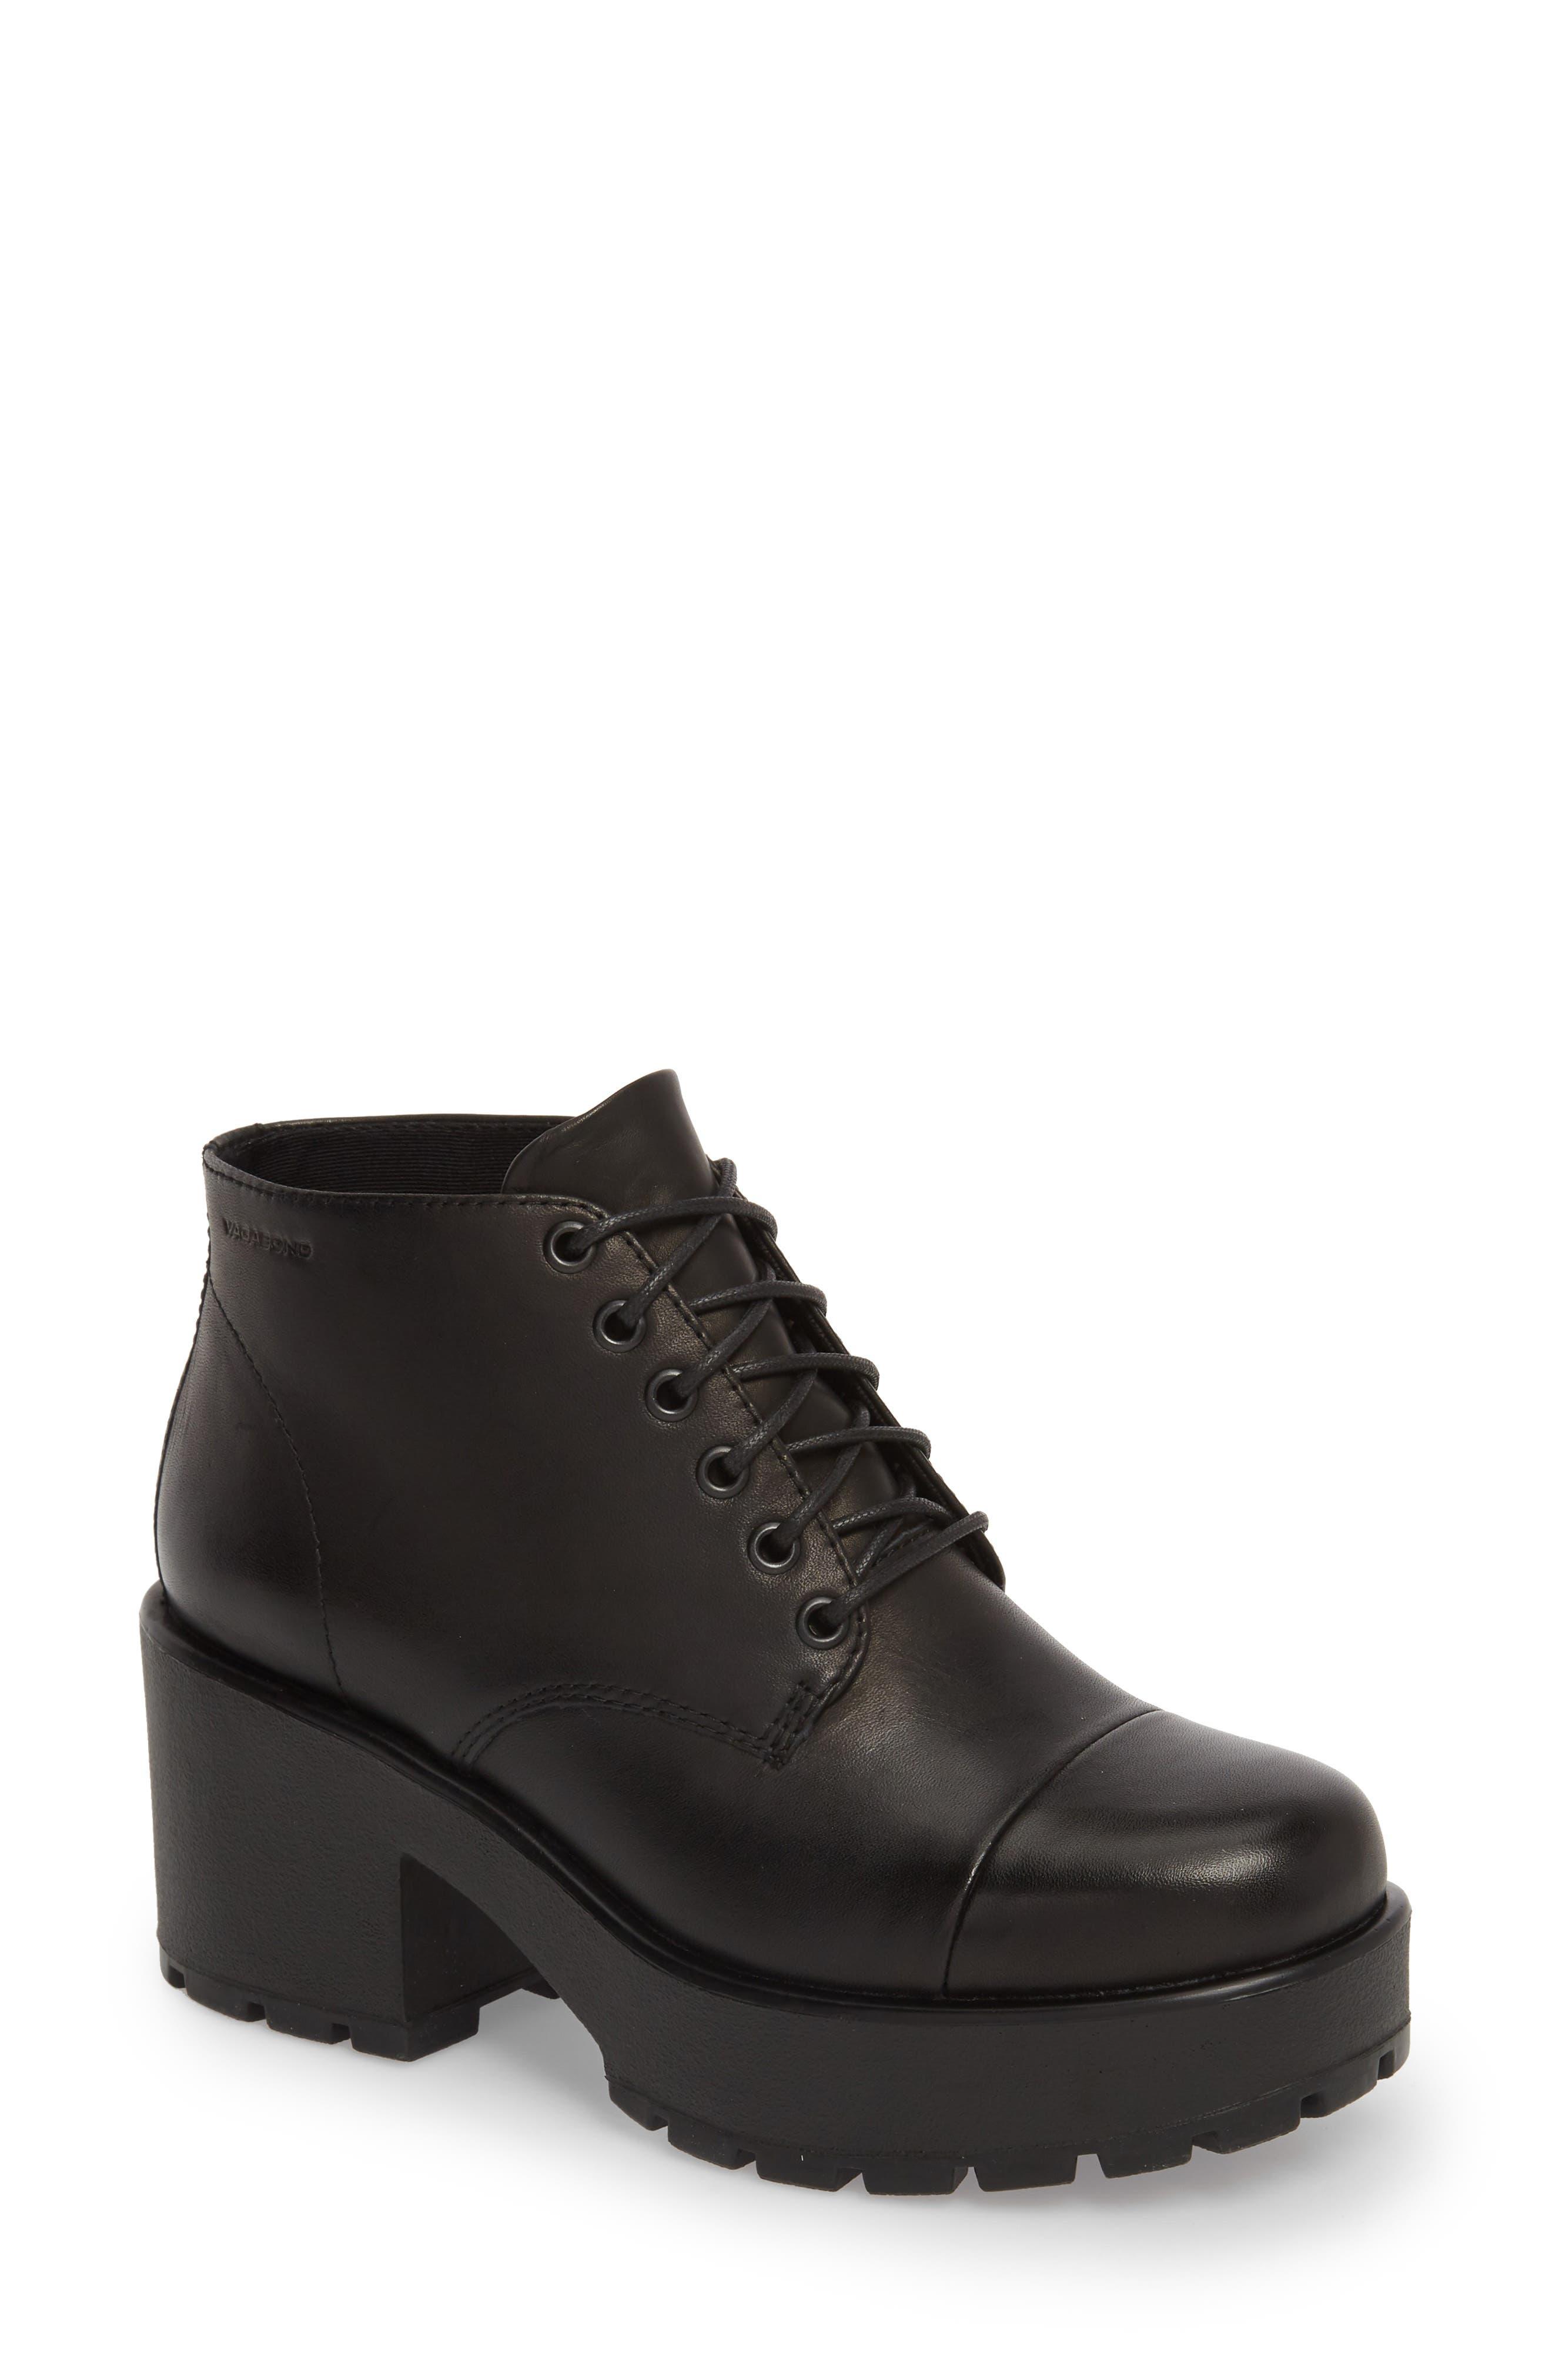 VAGABOND Shoemakers Dioon Cap Toe Bootie, Main, color, BLACK LEATHER